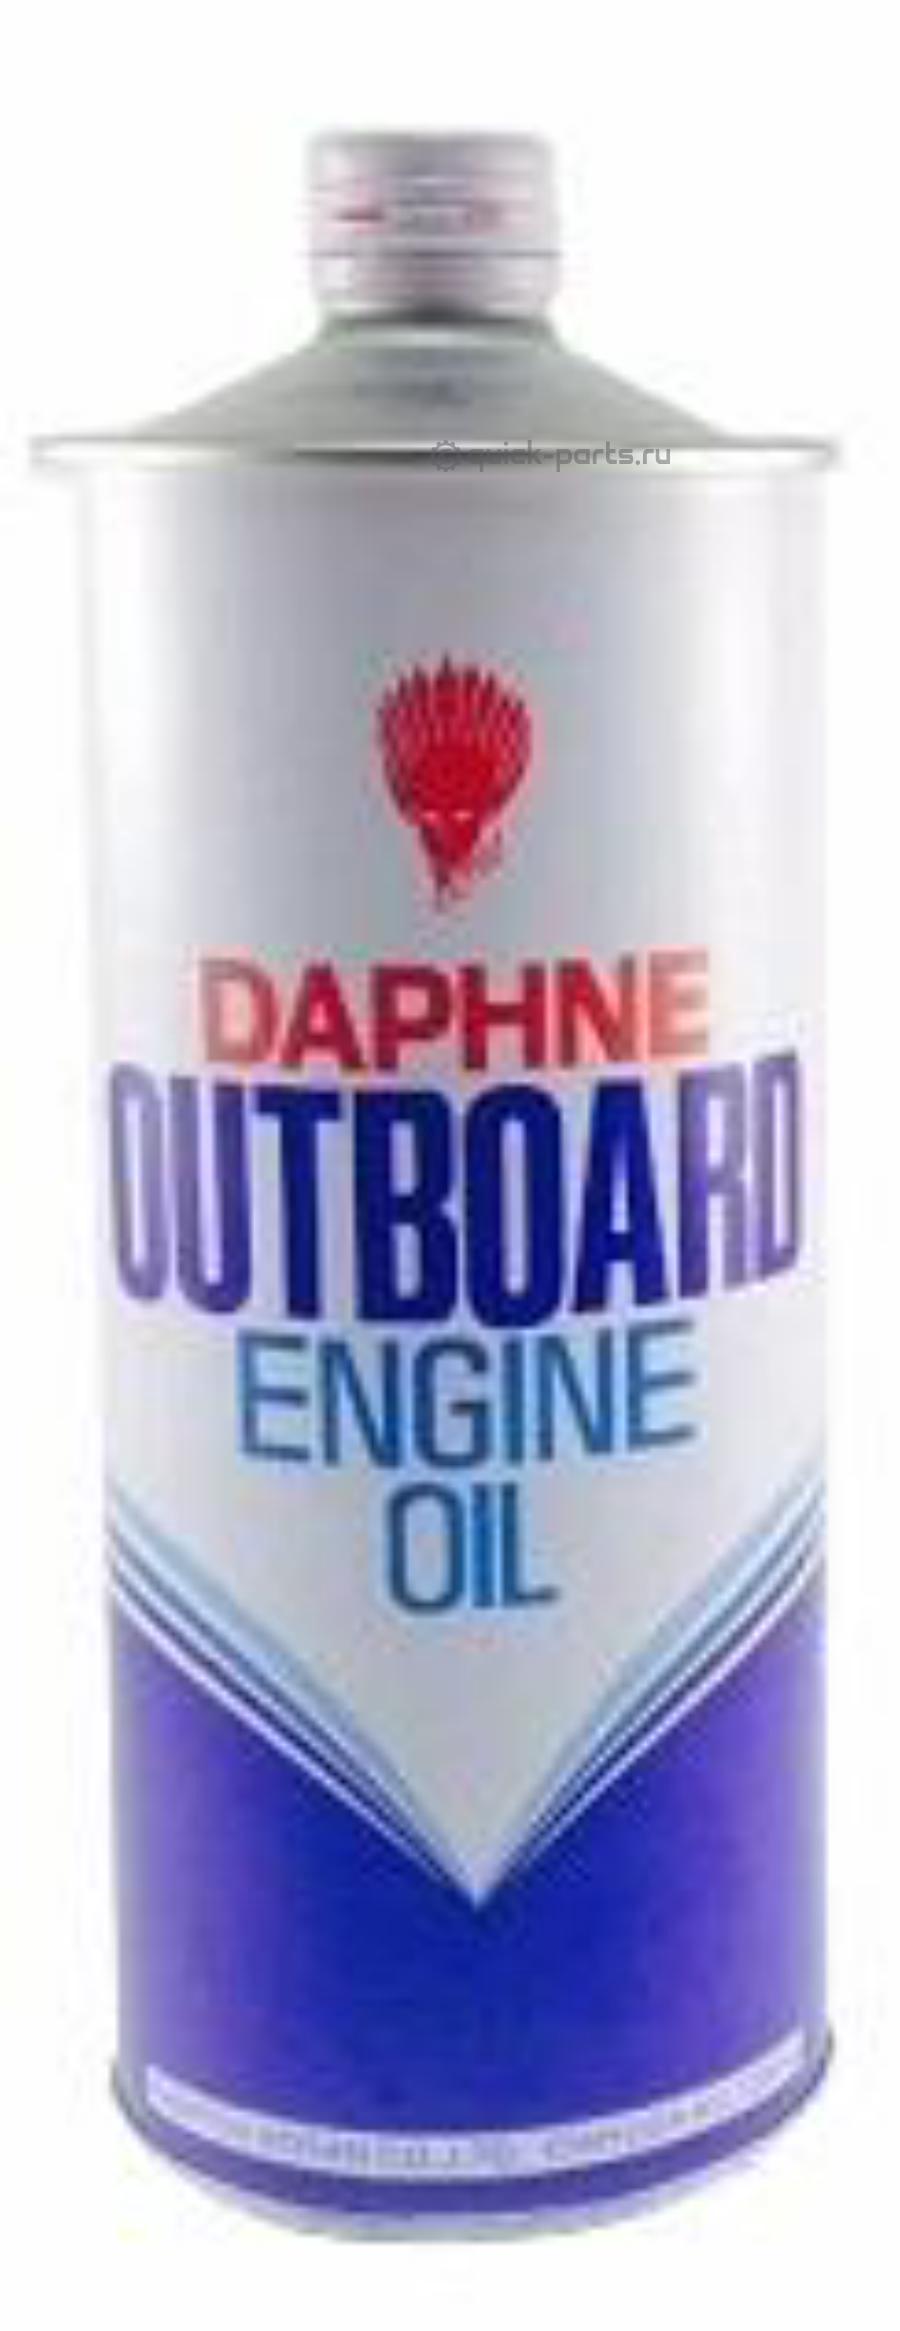 Idemitsu Daphne Outboard Engine Oil TC-W3